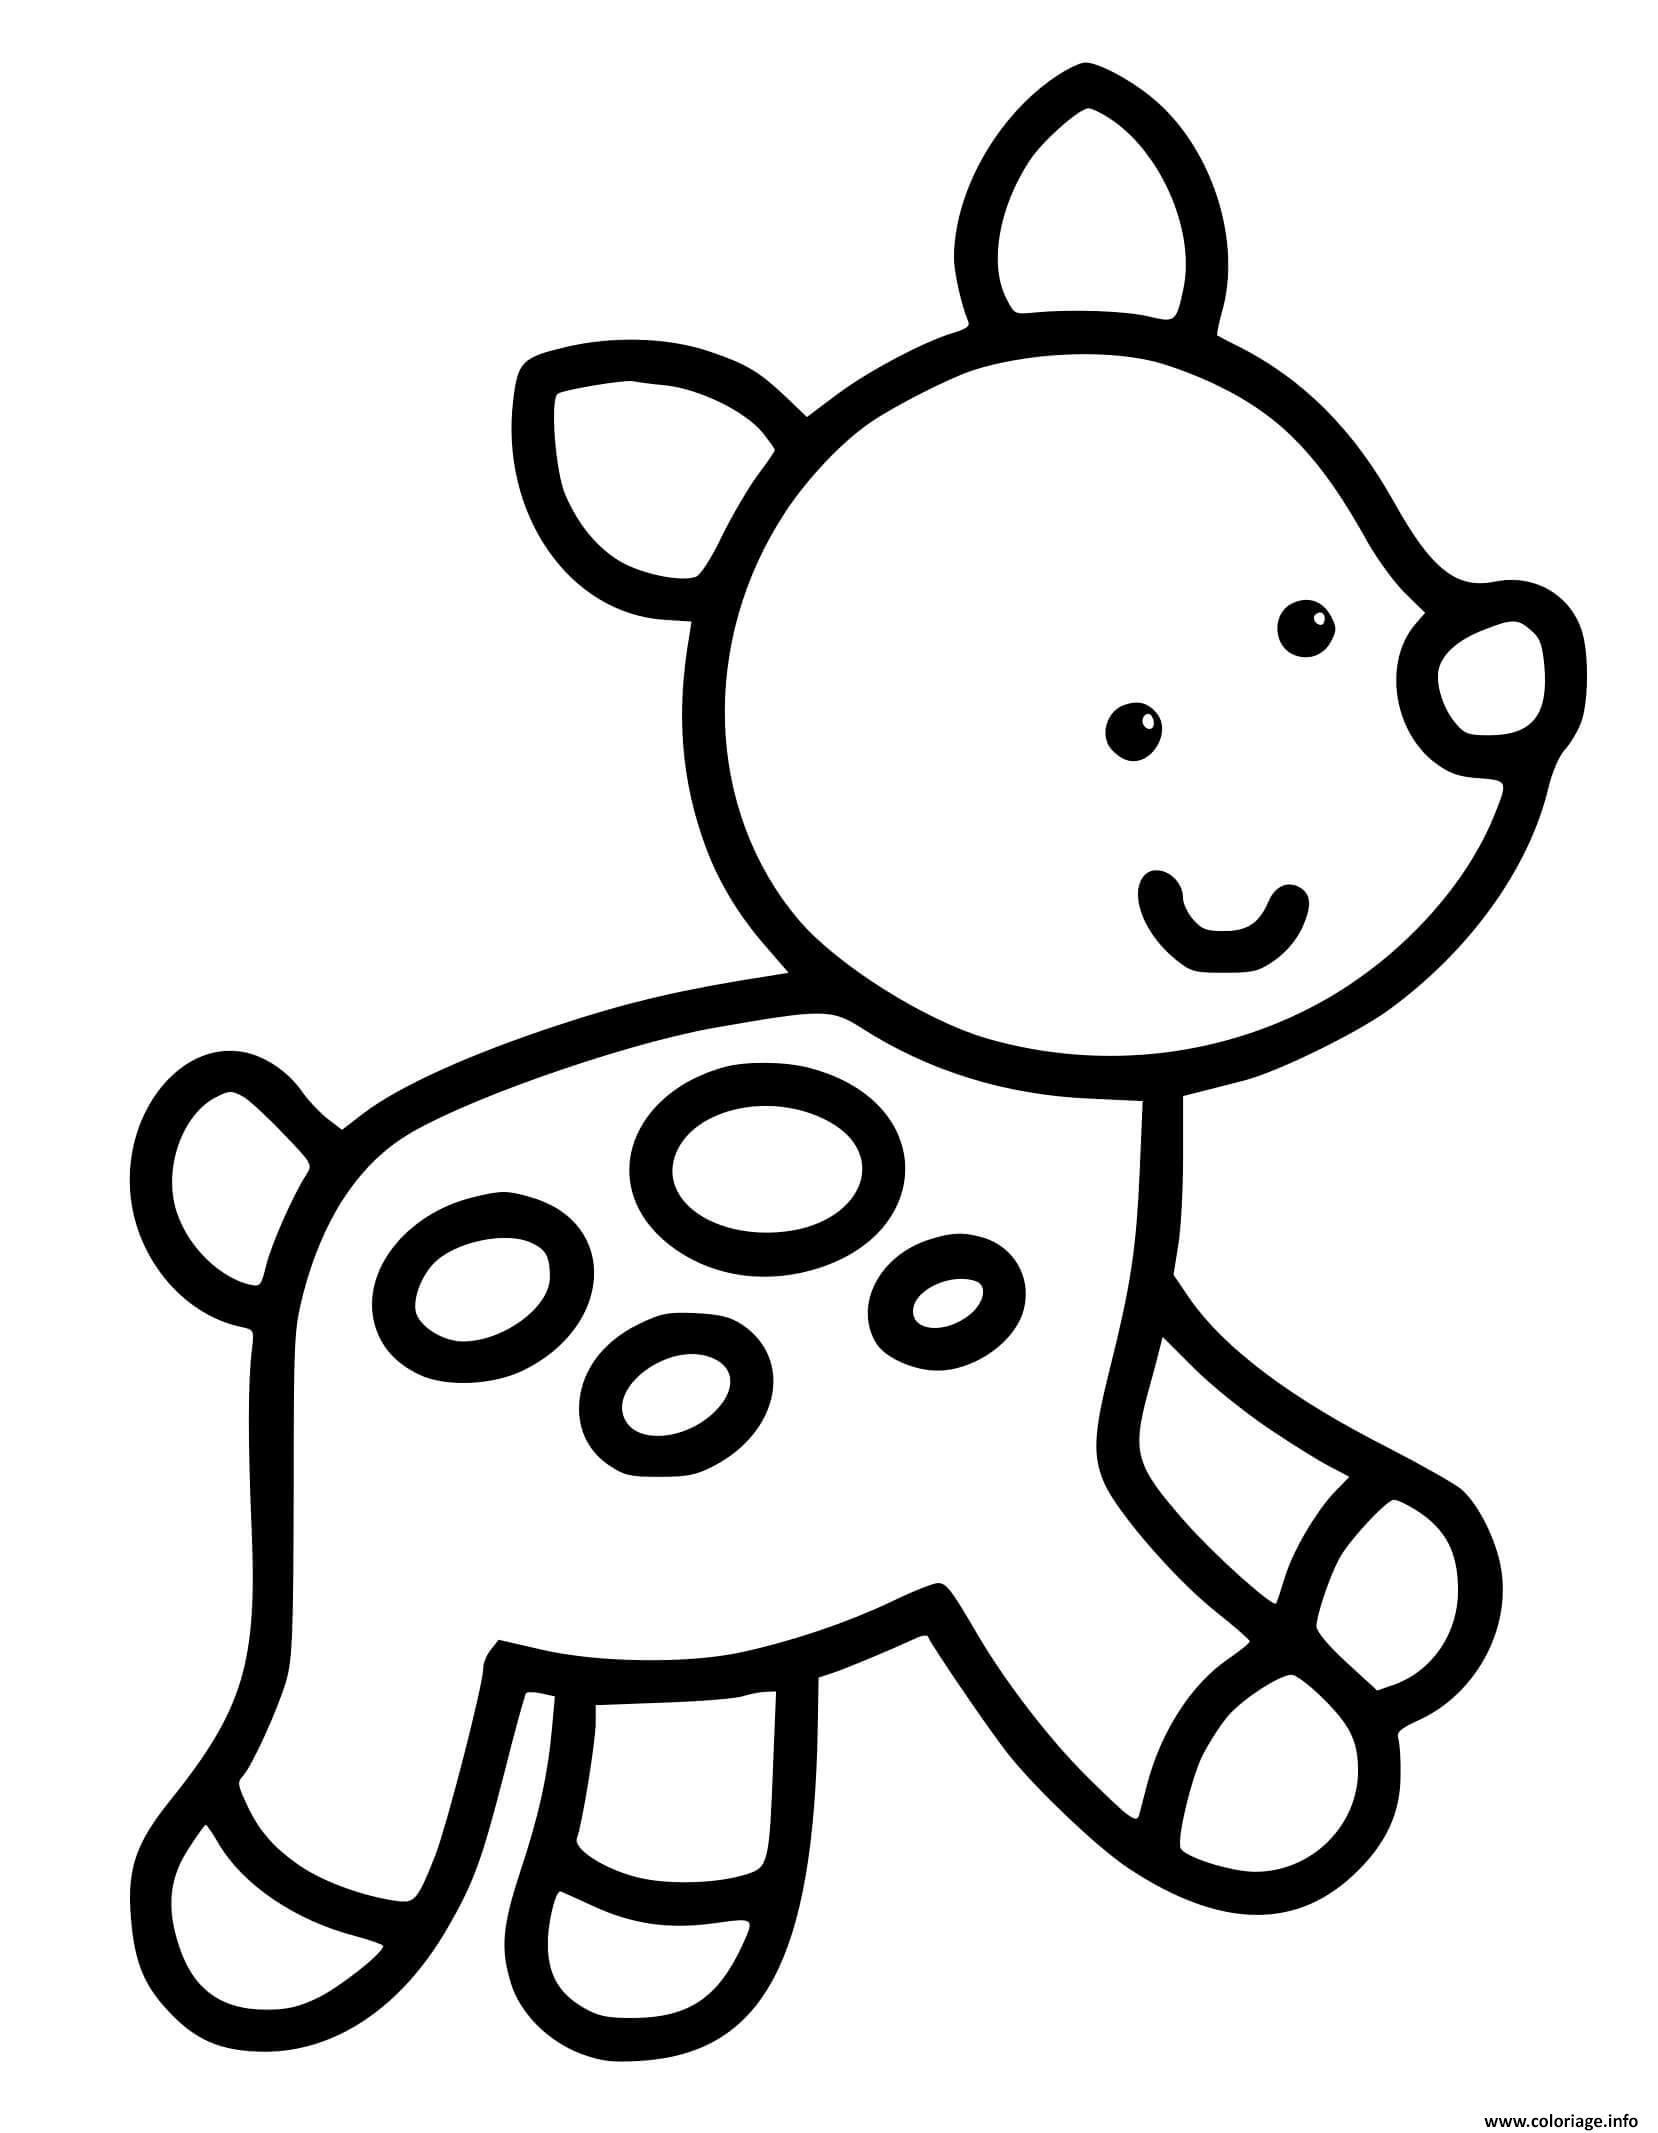 Coloriage Animal Facile Maternelle 32 Ans Dessin Facile à imprimer